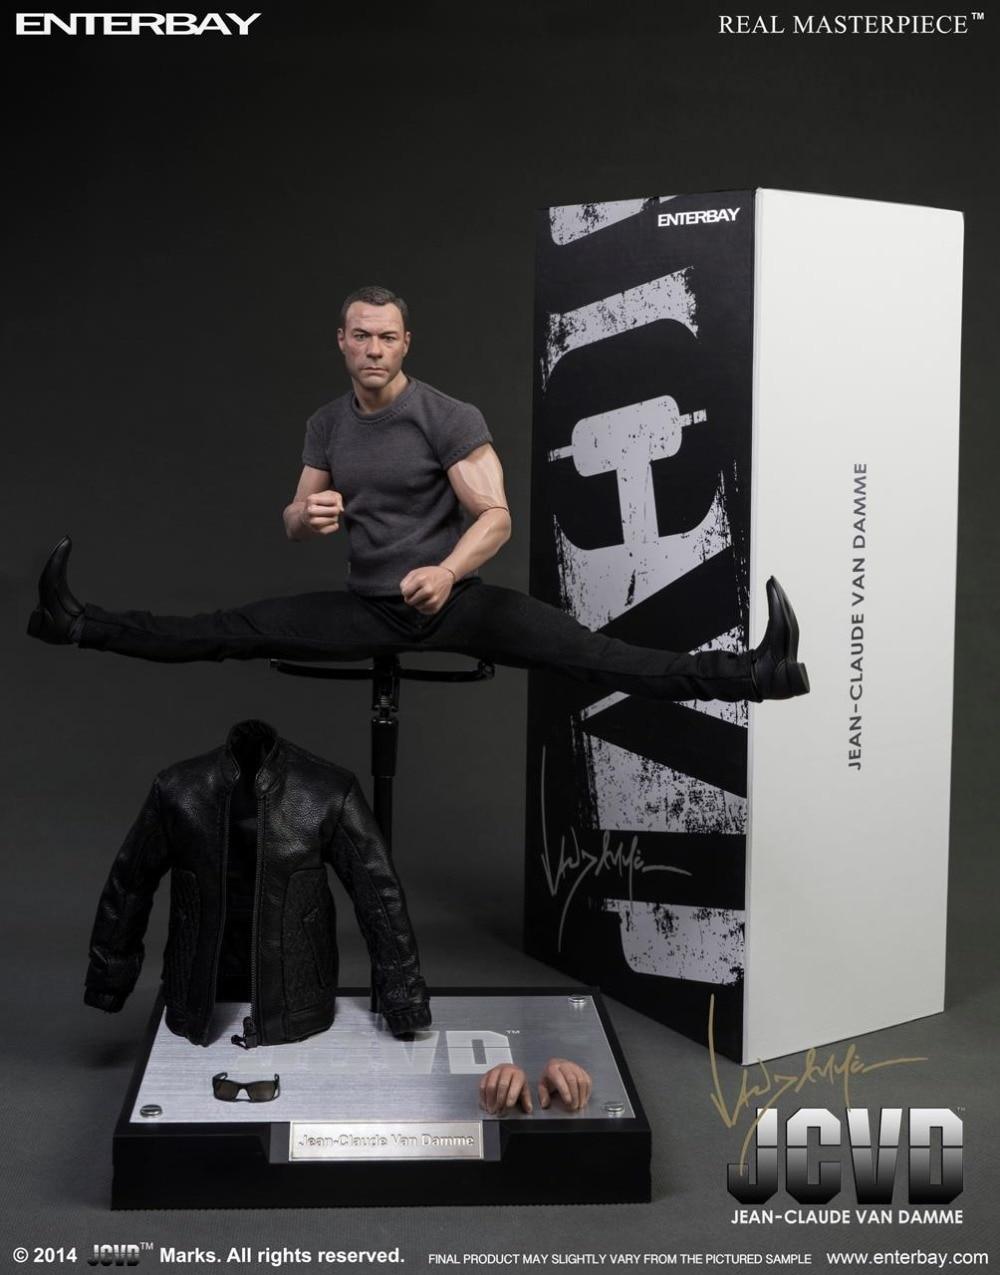 1/6 scale figure doll Jean-Claude Van Damme JCVD 12 Action figure doll Collectible Figure Plastic Model Toys